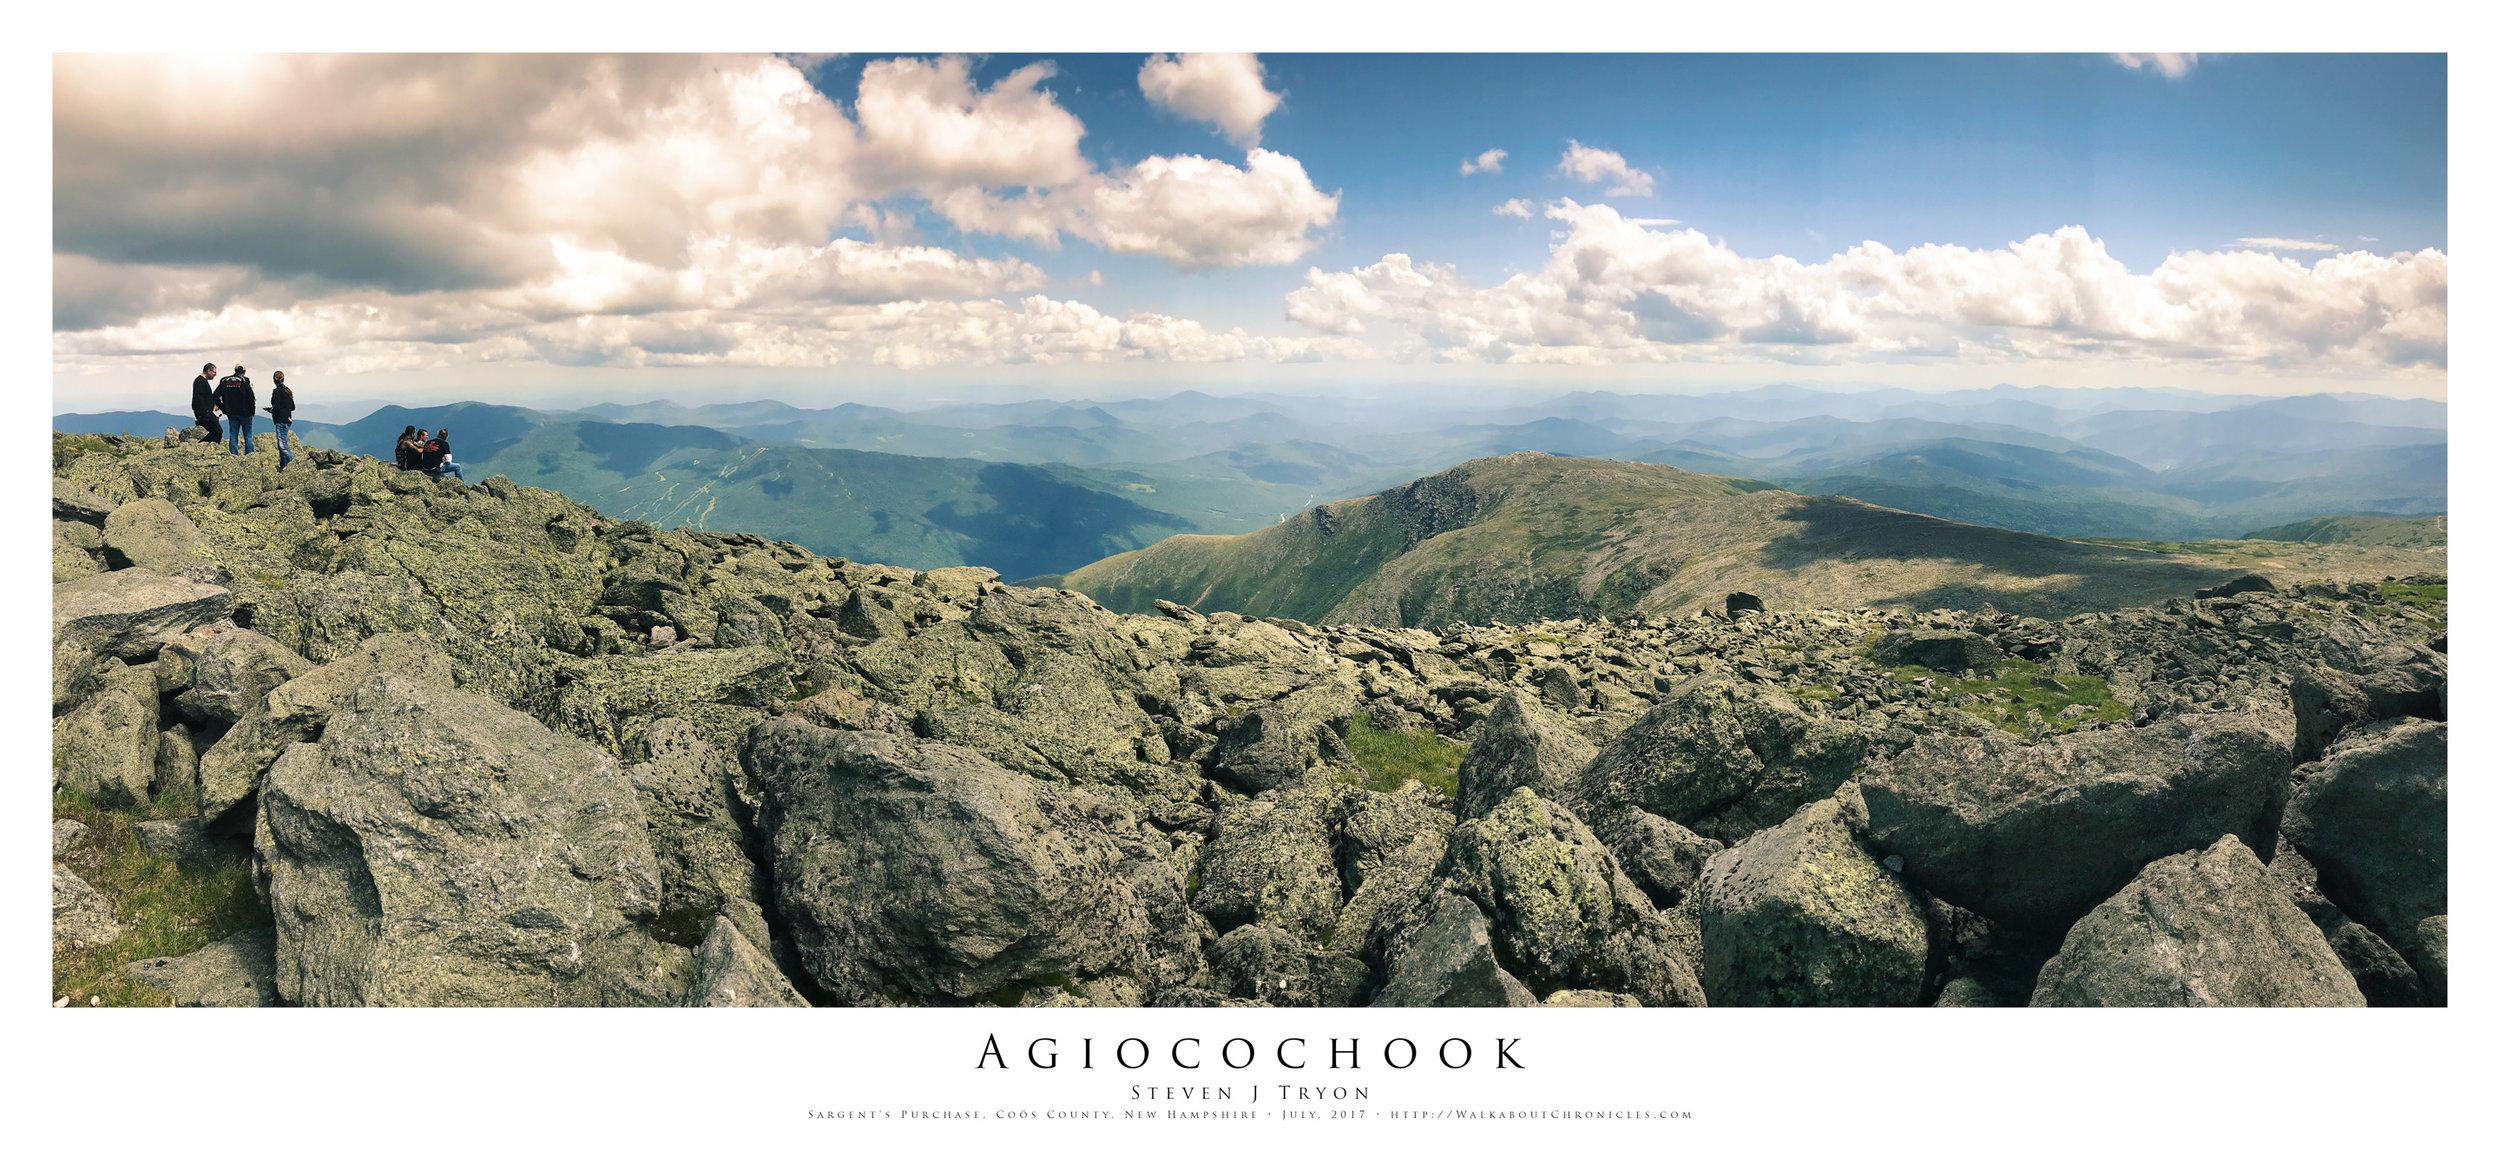 Agiocochook